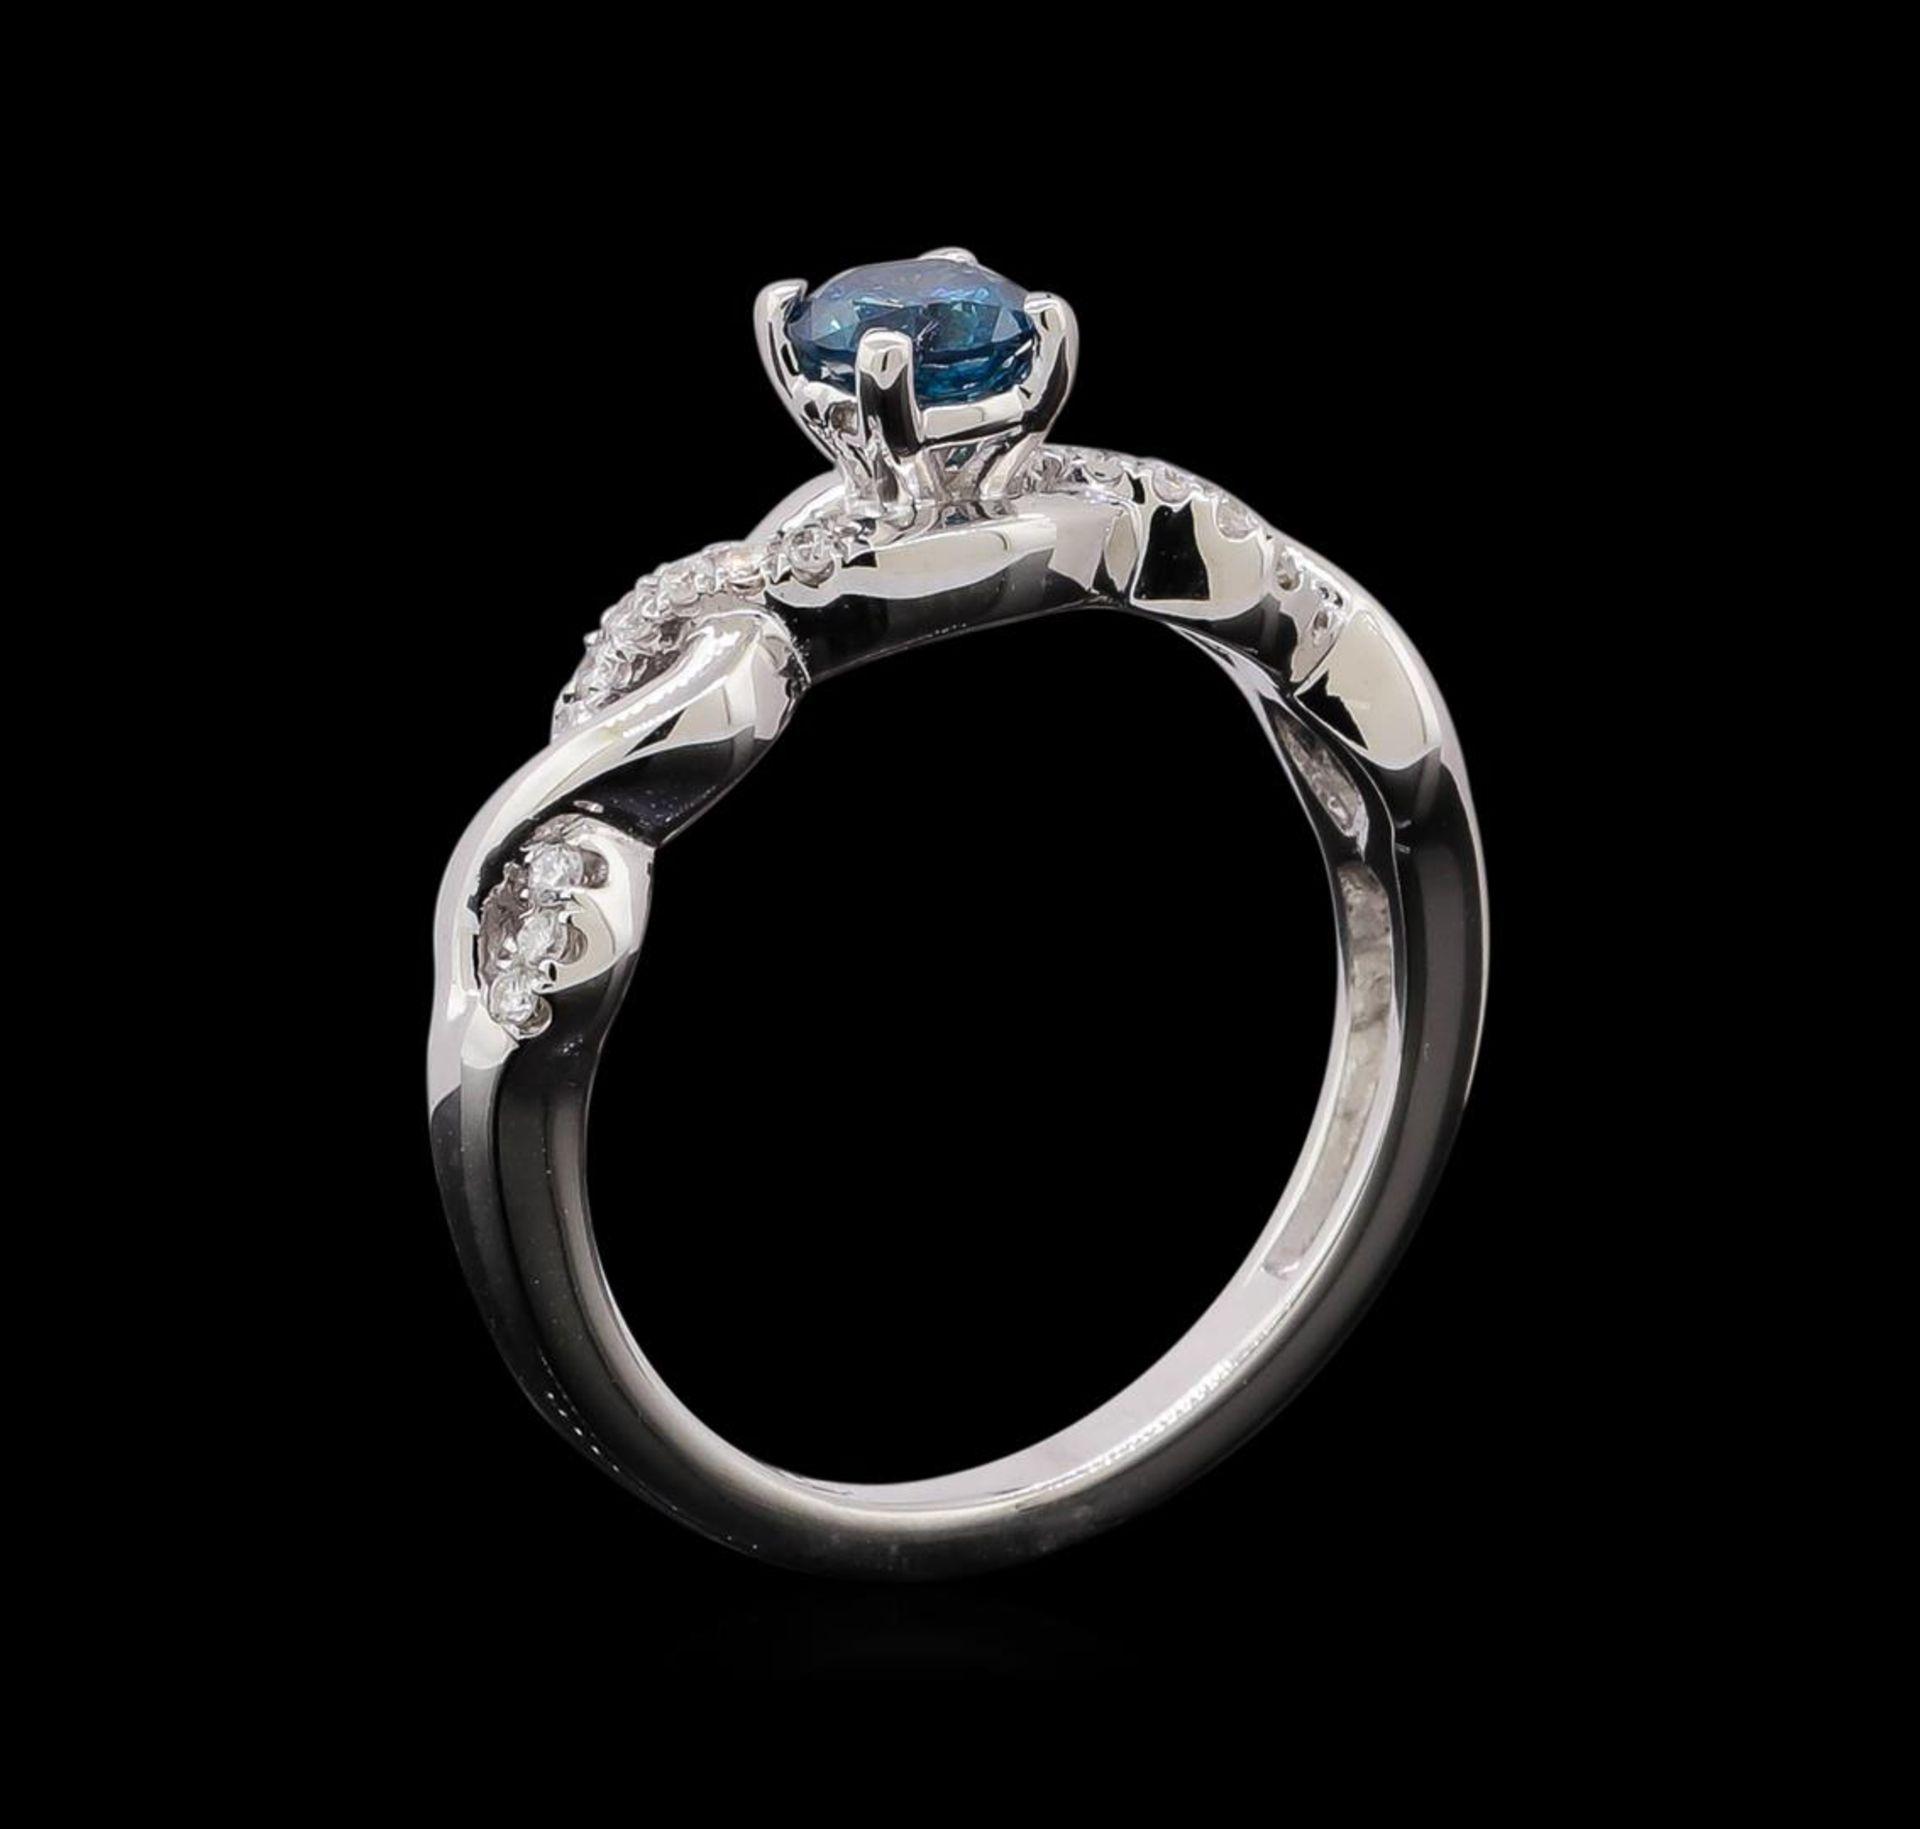 0.49 ctw Blue Diamond Ring - 14KT White Gold - Image 4 of 4